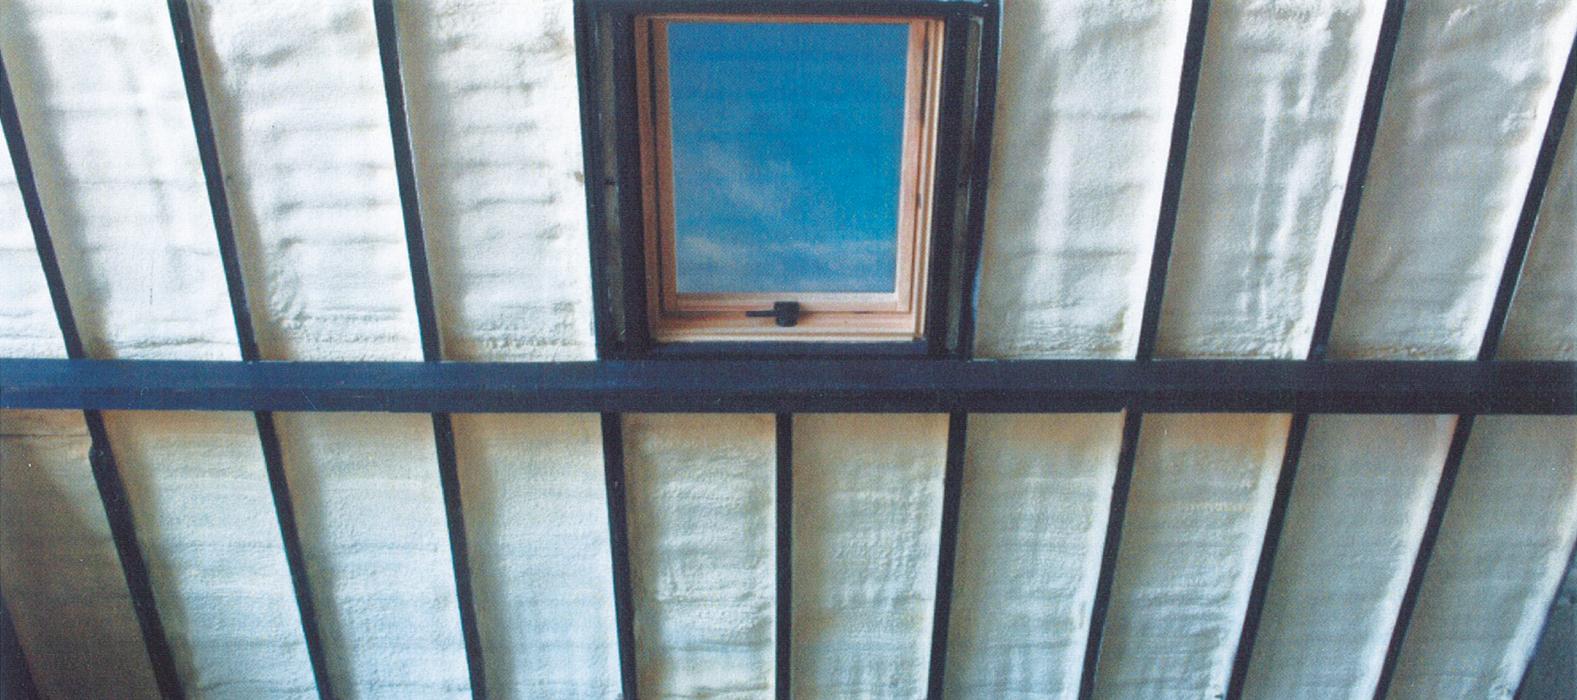 Spray foam roof insulation